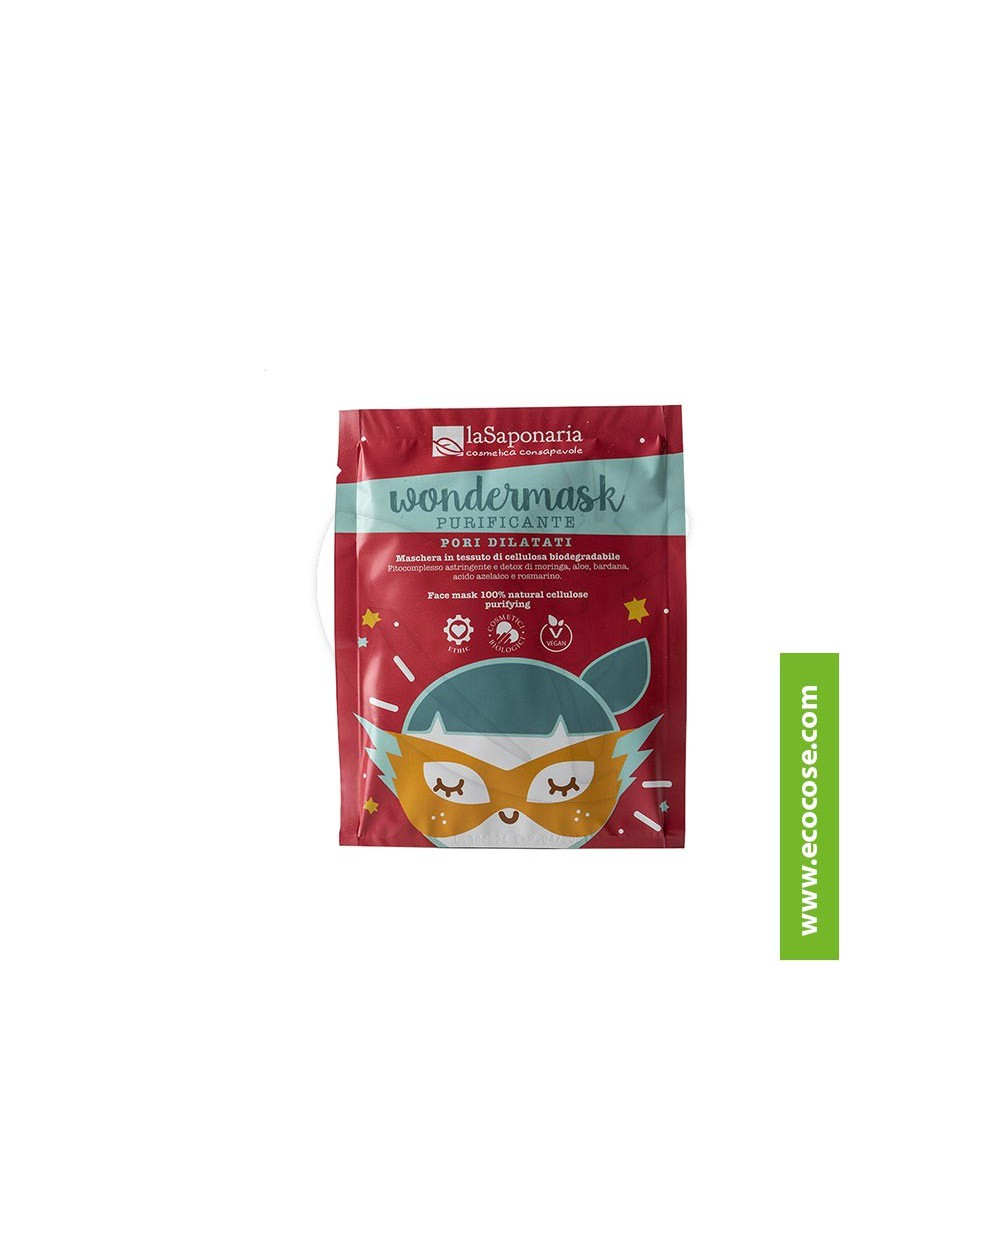 La Saponaria - Wondermask - Maschera in tessuto (biodegradabile) purificante